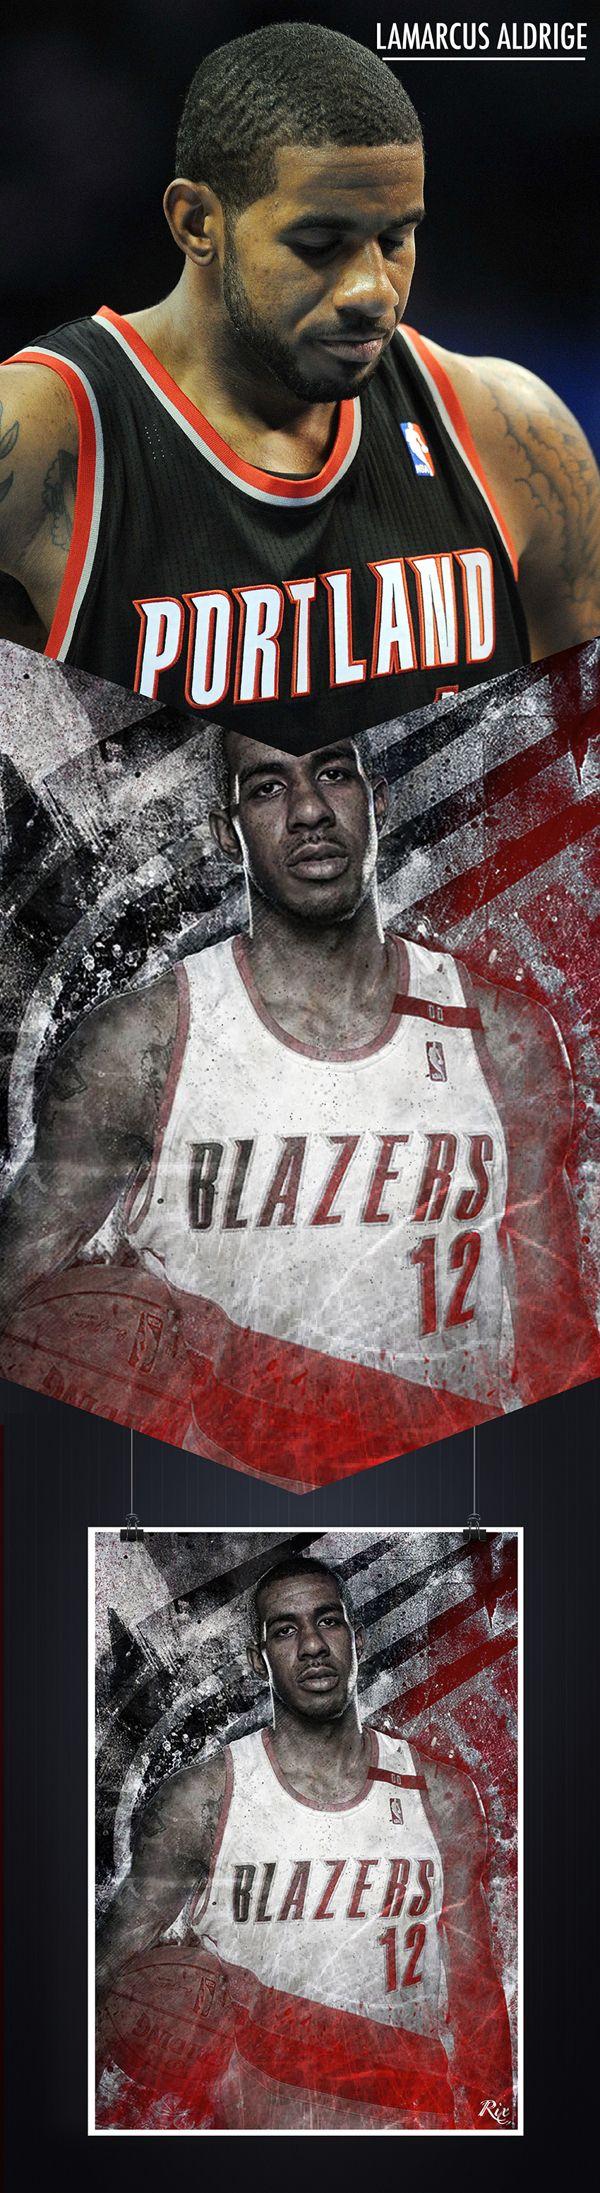 NBA Posters by Riccardo Ferro, via Behance